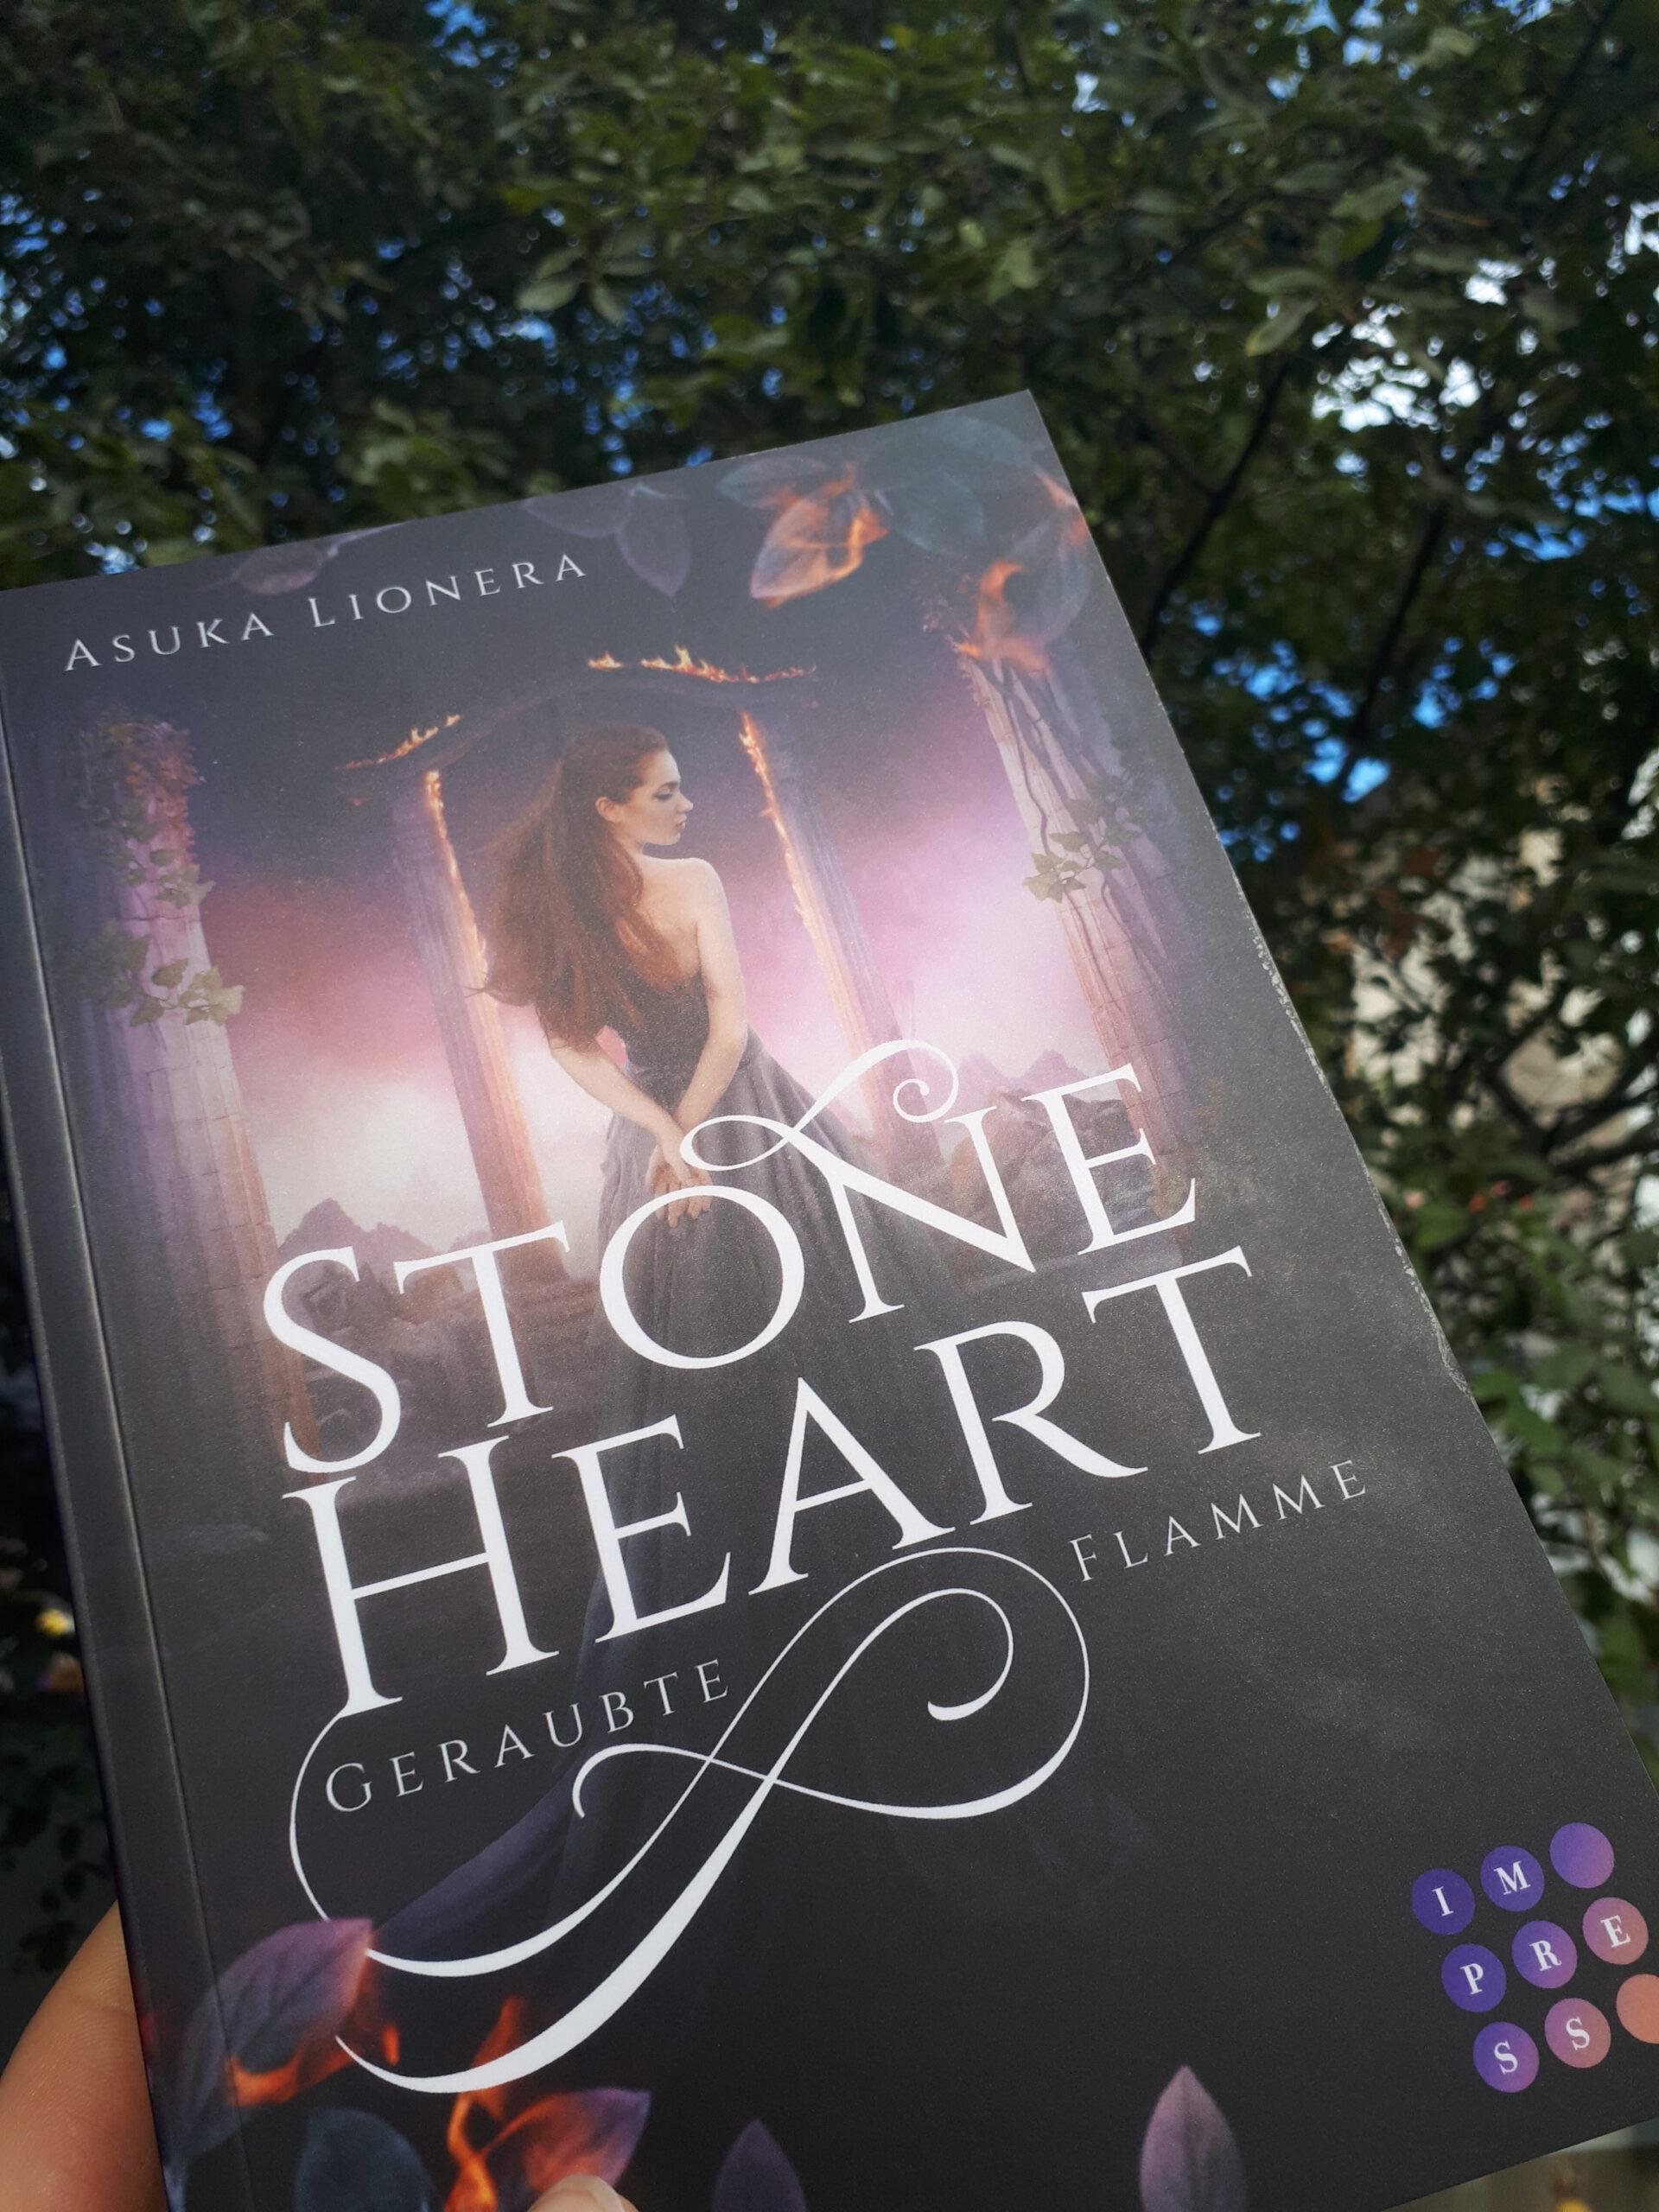 [Werbung] Stoneheart: Geraubte Flamme – Asuka Lionera